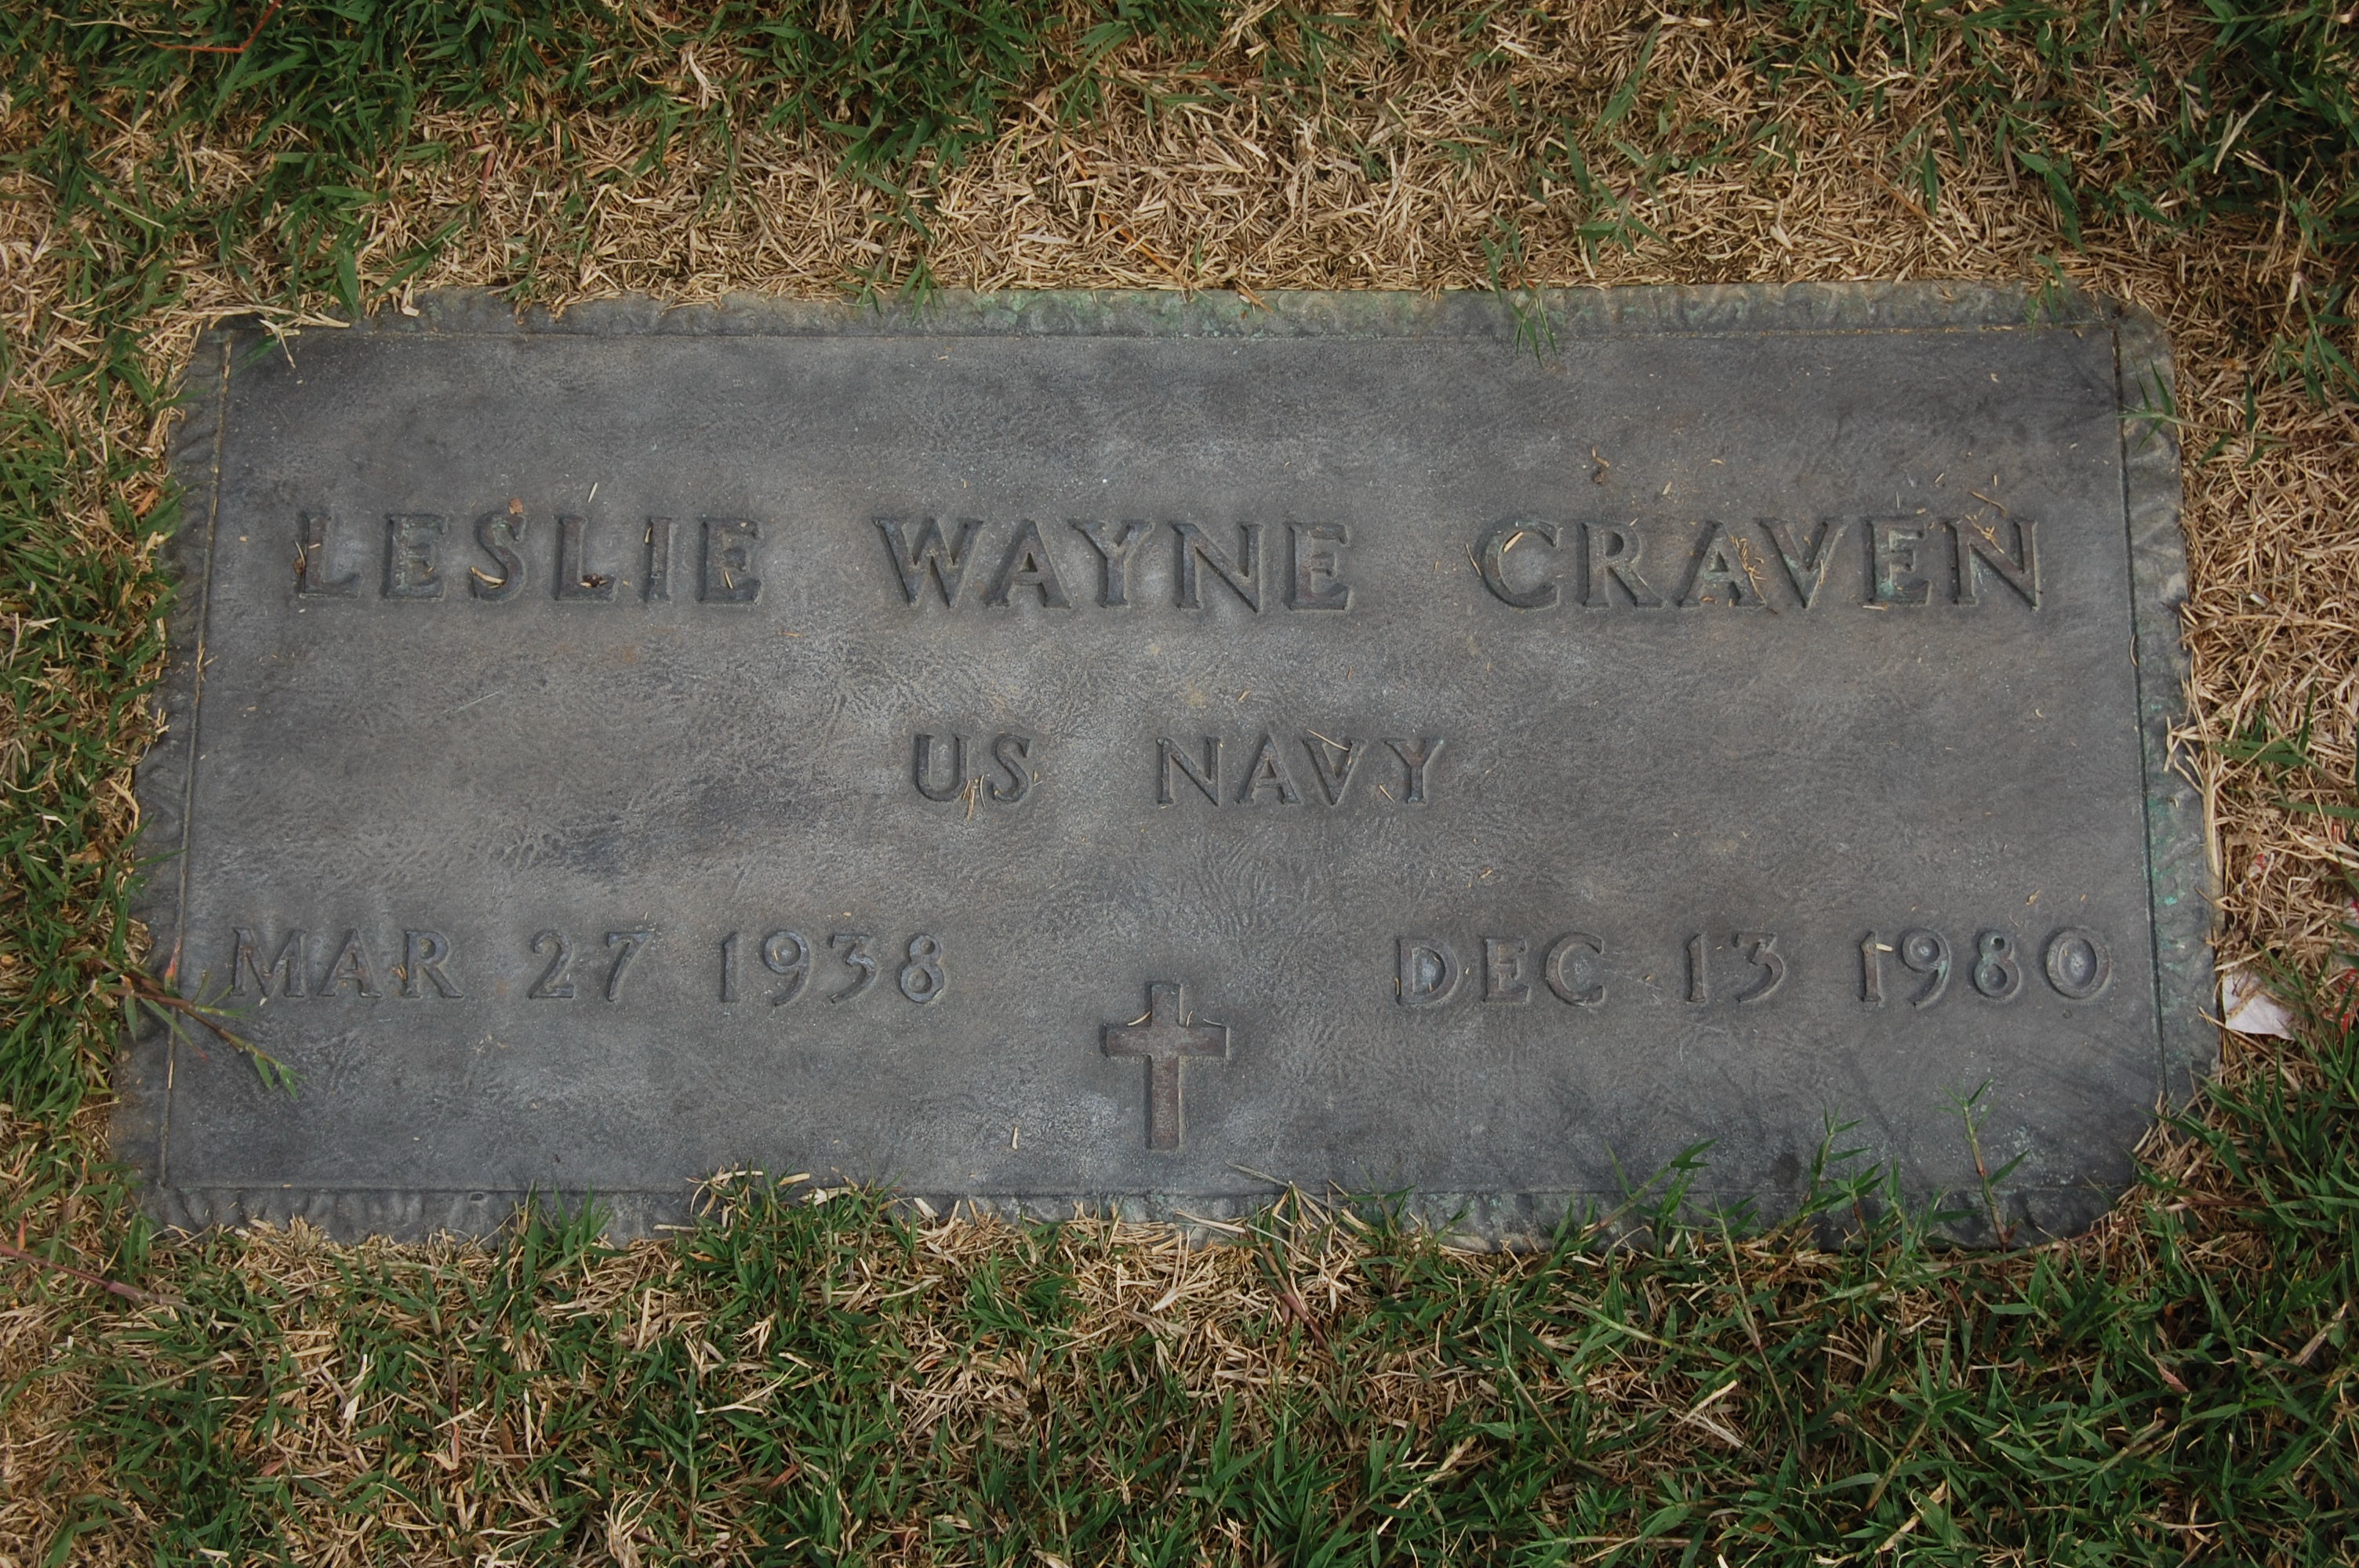 Wayne Craven